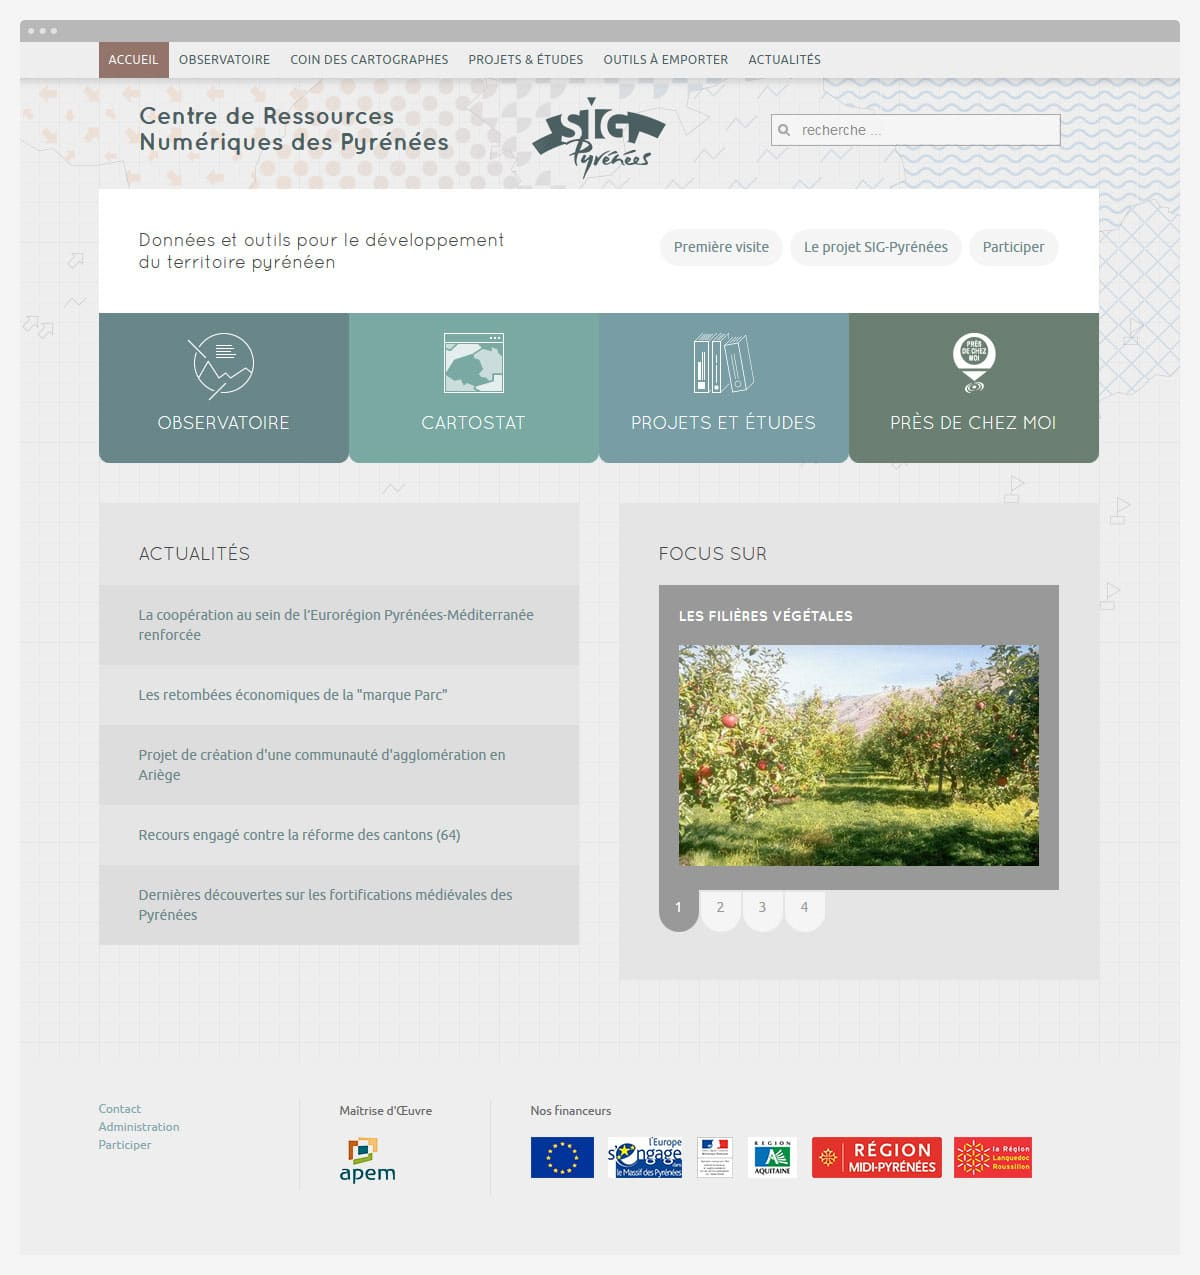 yves-saint-lary-sig-pyrenees-web-design-accueil